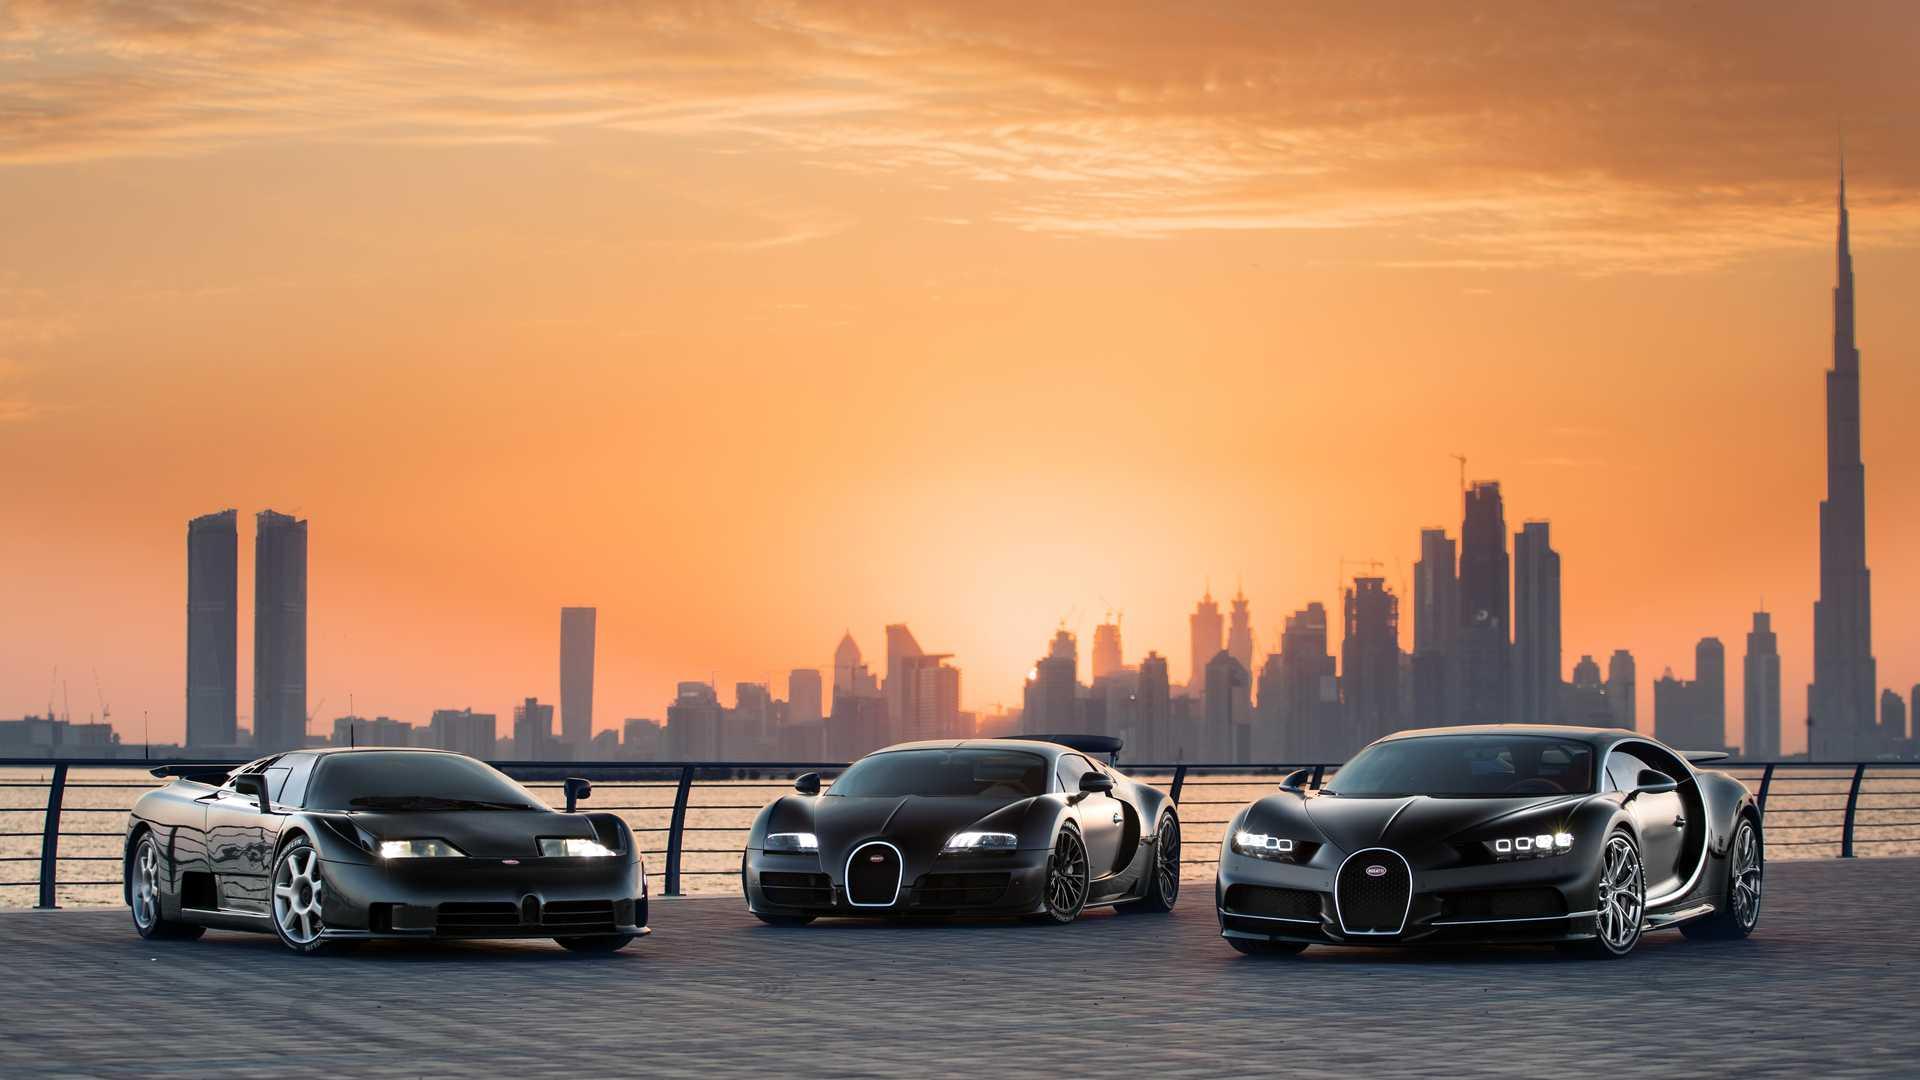 bugatti-chiron-veyron-and-eb110-in-dubai